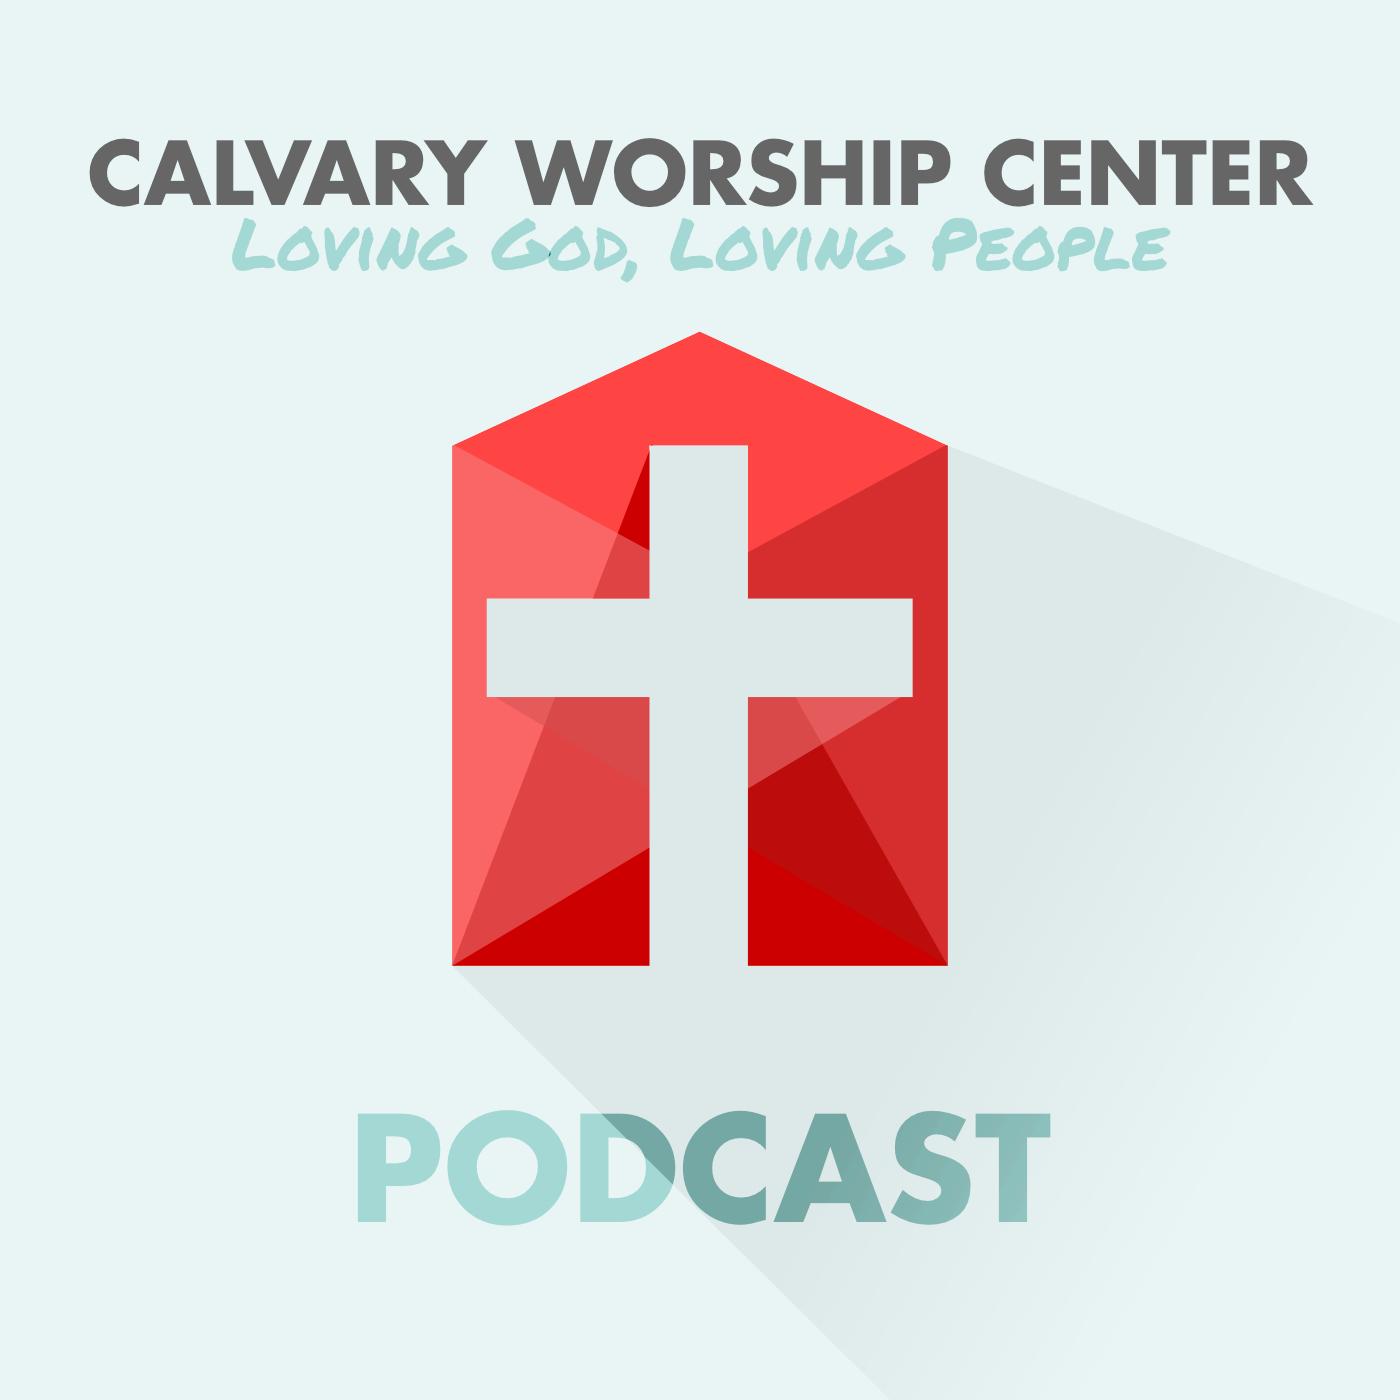 Podcast - Calvary Worship Center